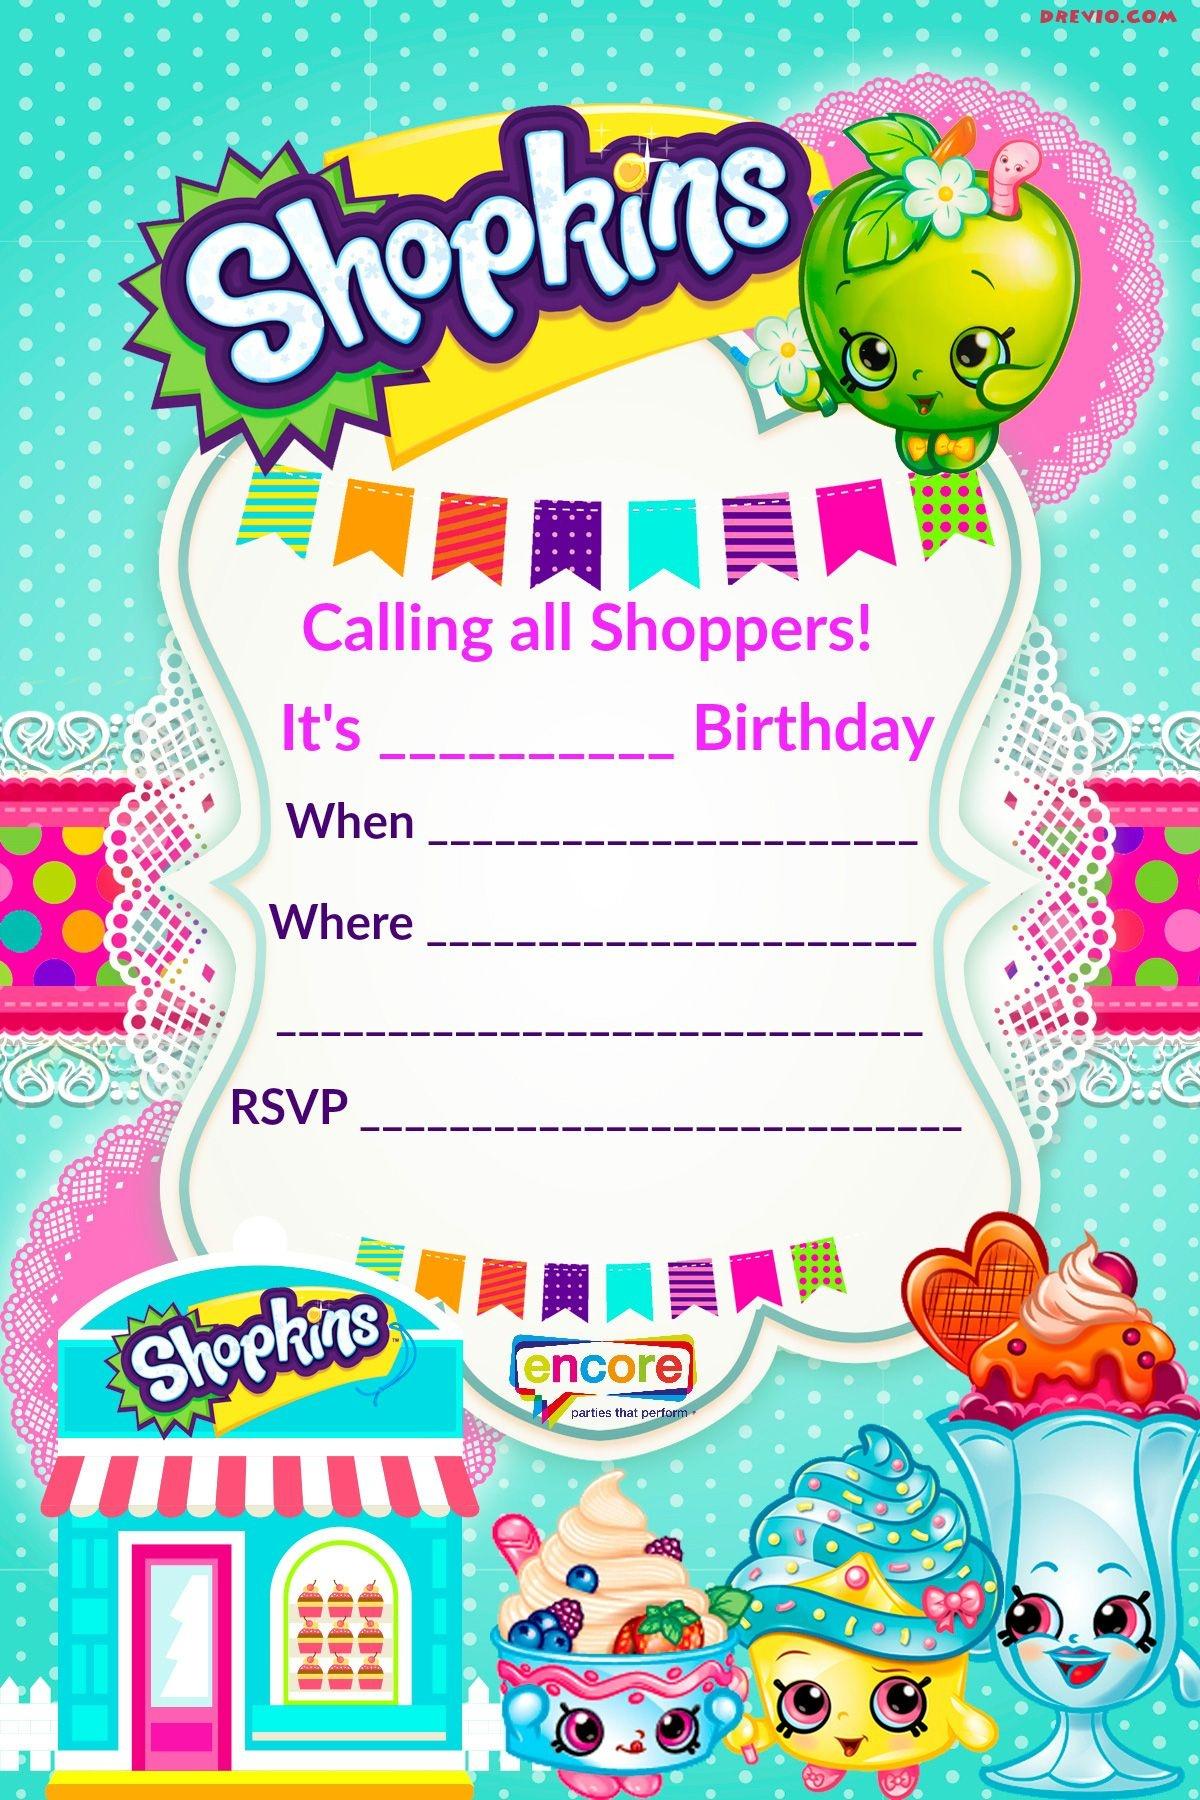 Updated - Free Printable Shopkins Birthday Invitation Template - Shopkins Free Printables